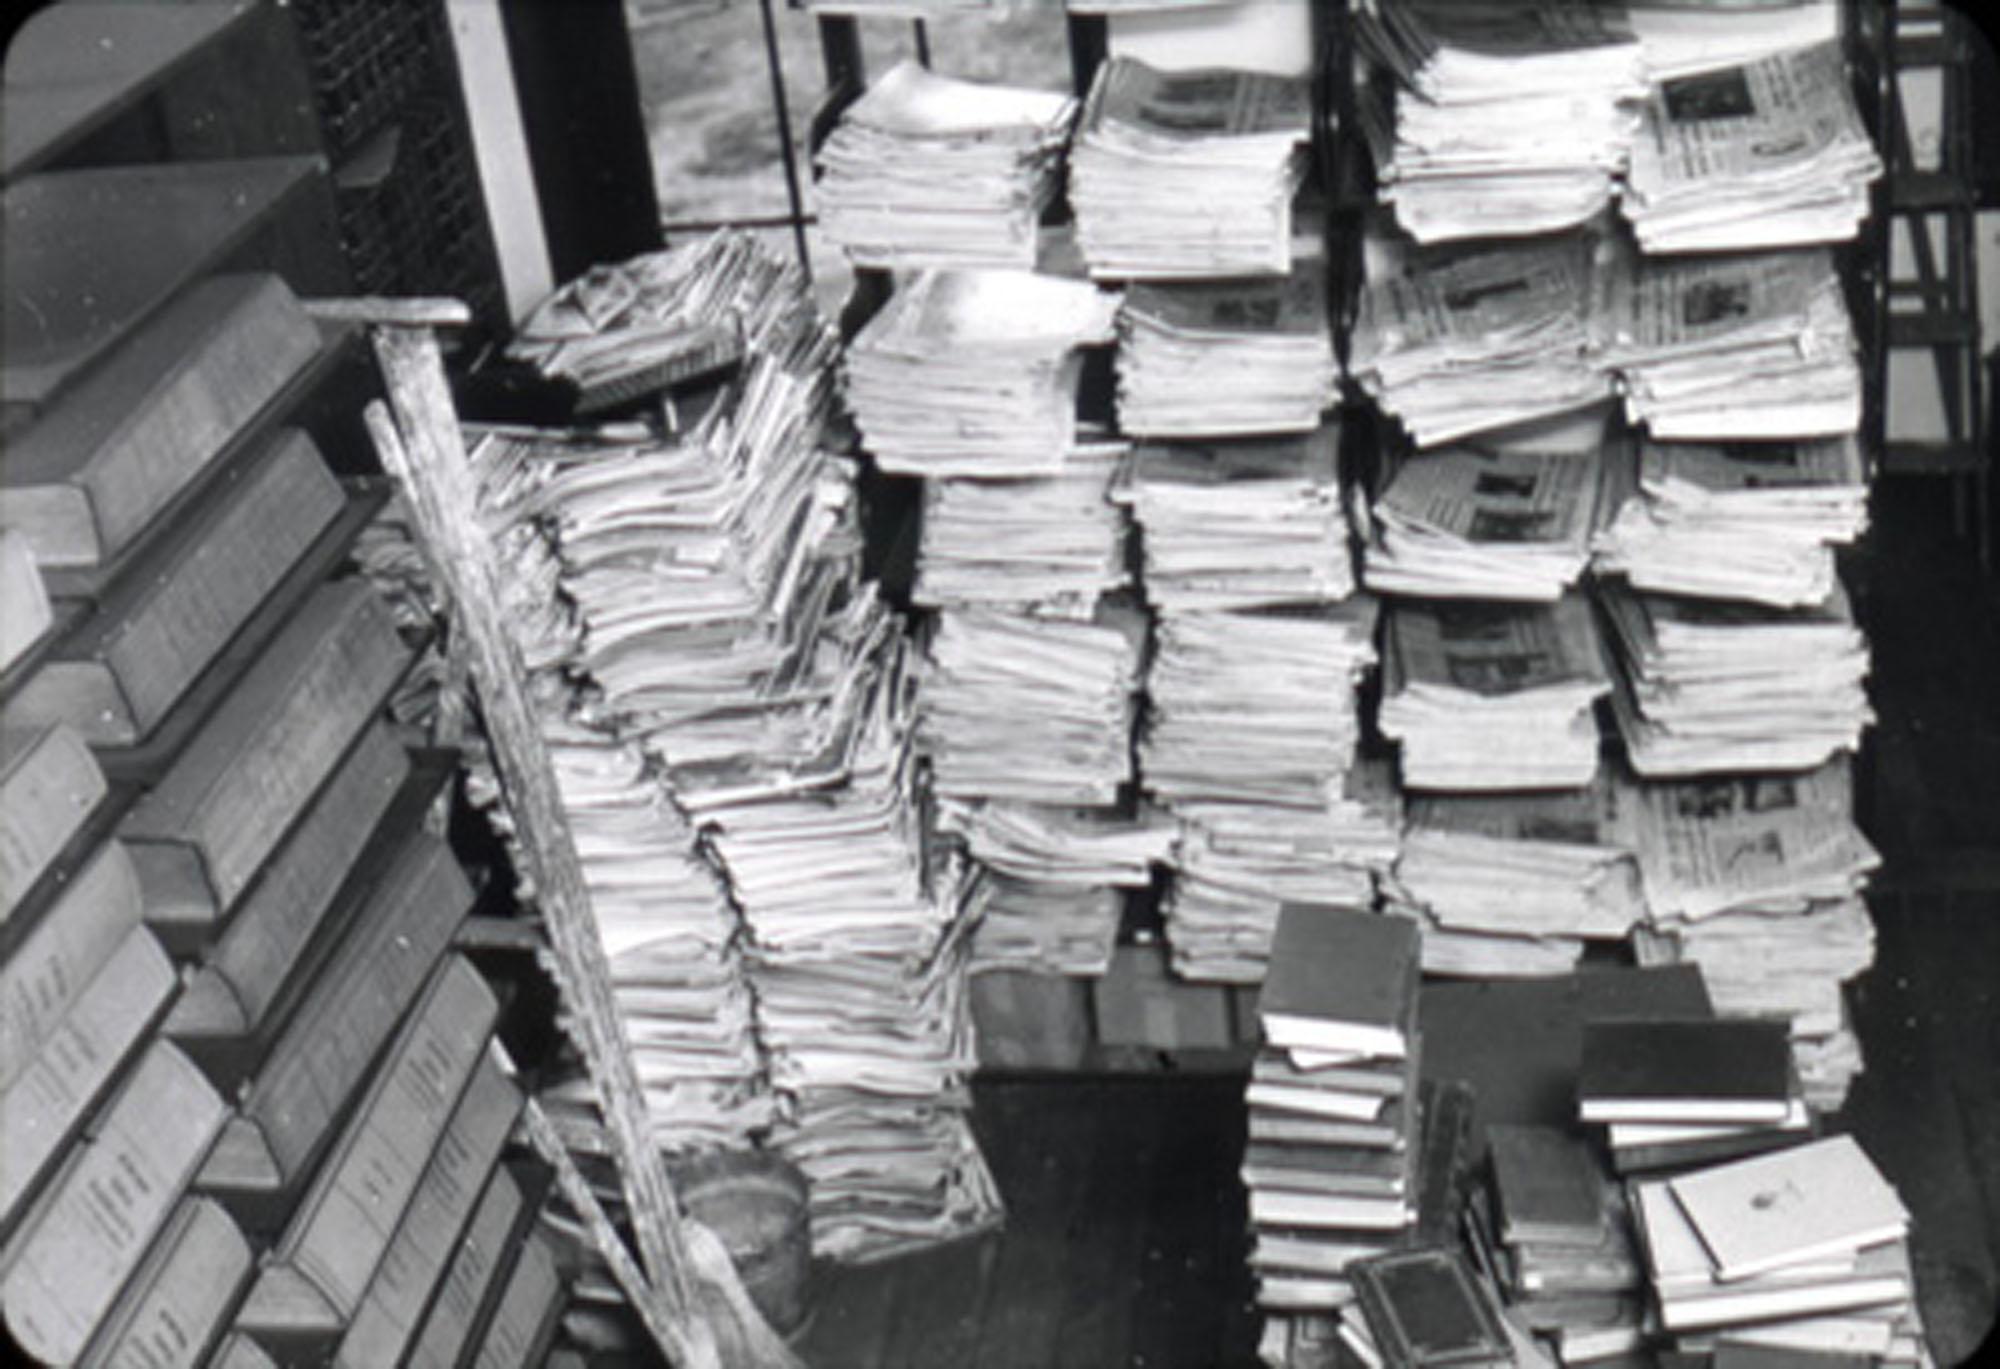 Janitor's closet, Main Library